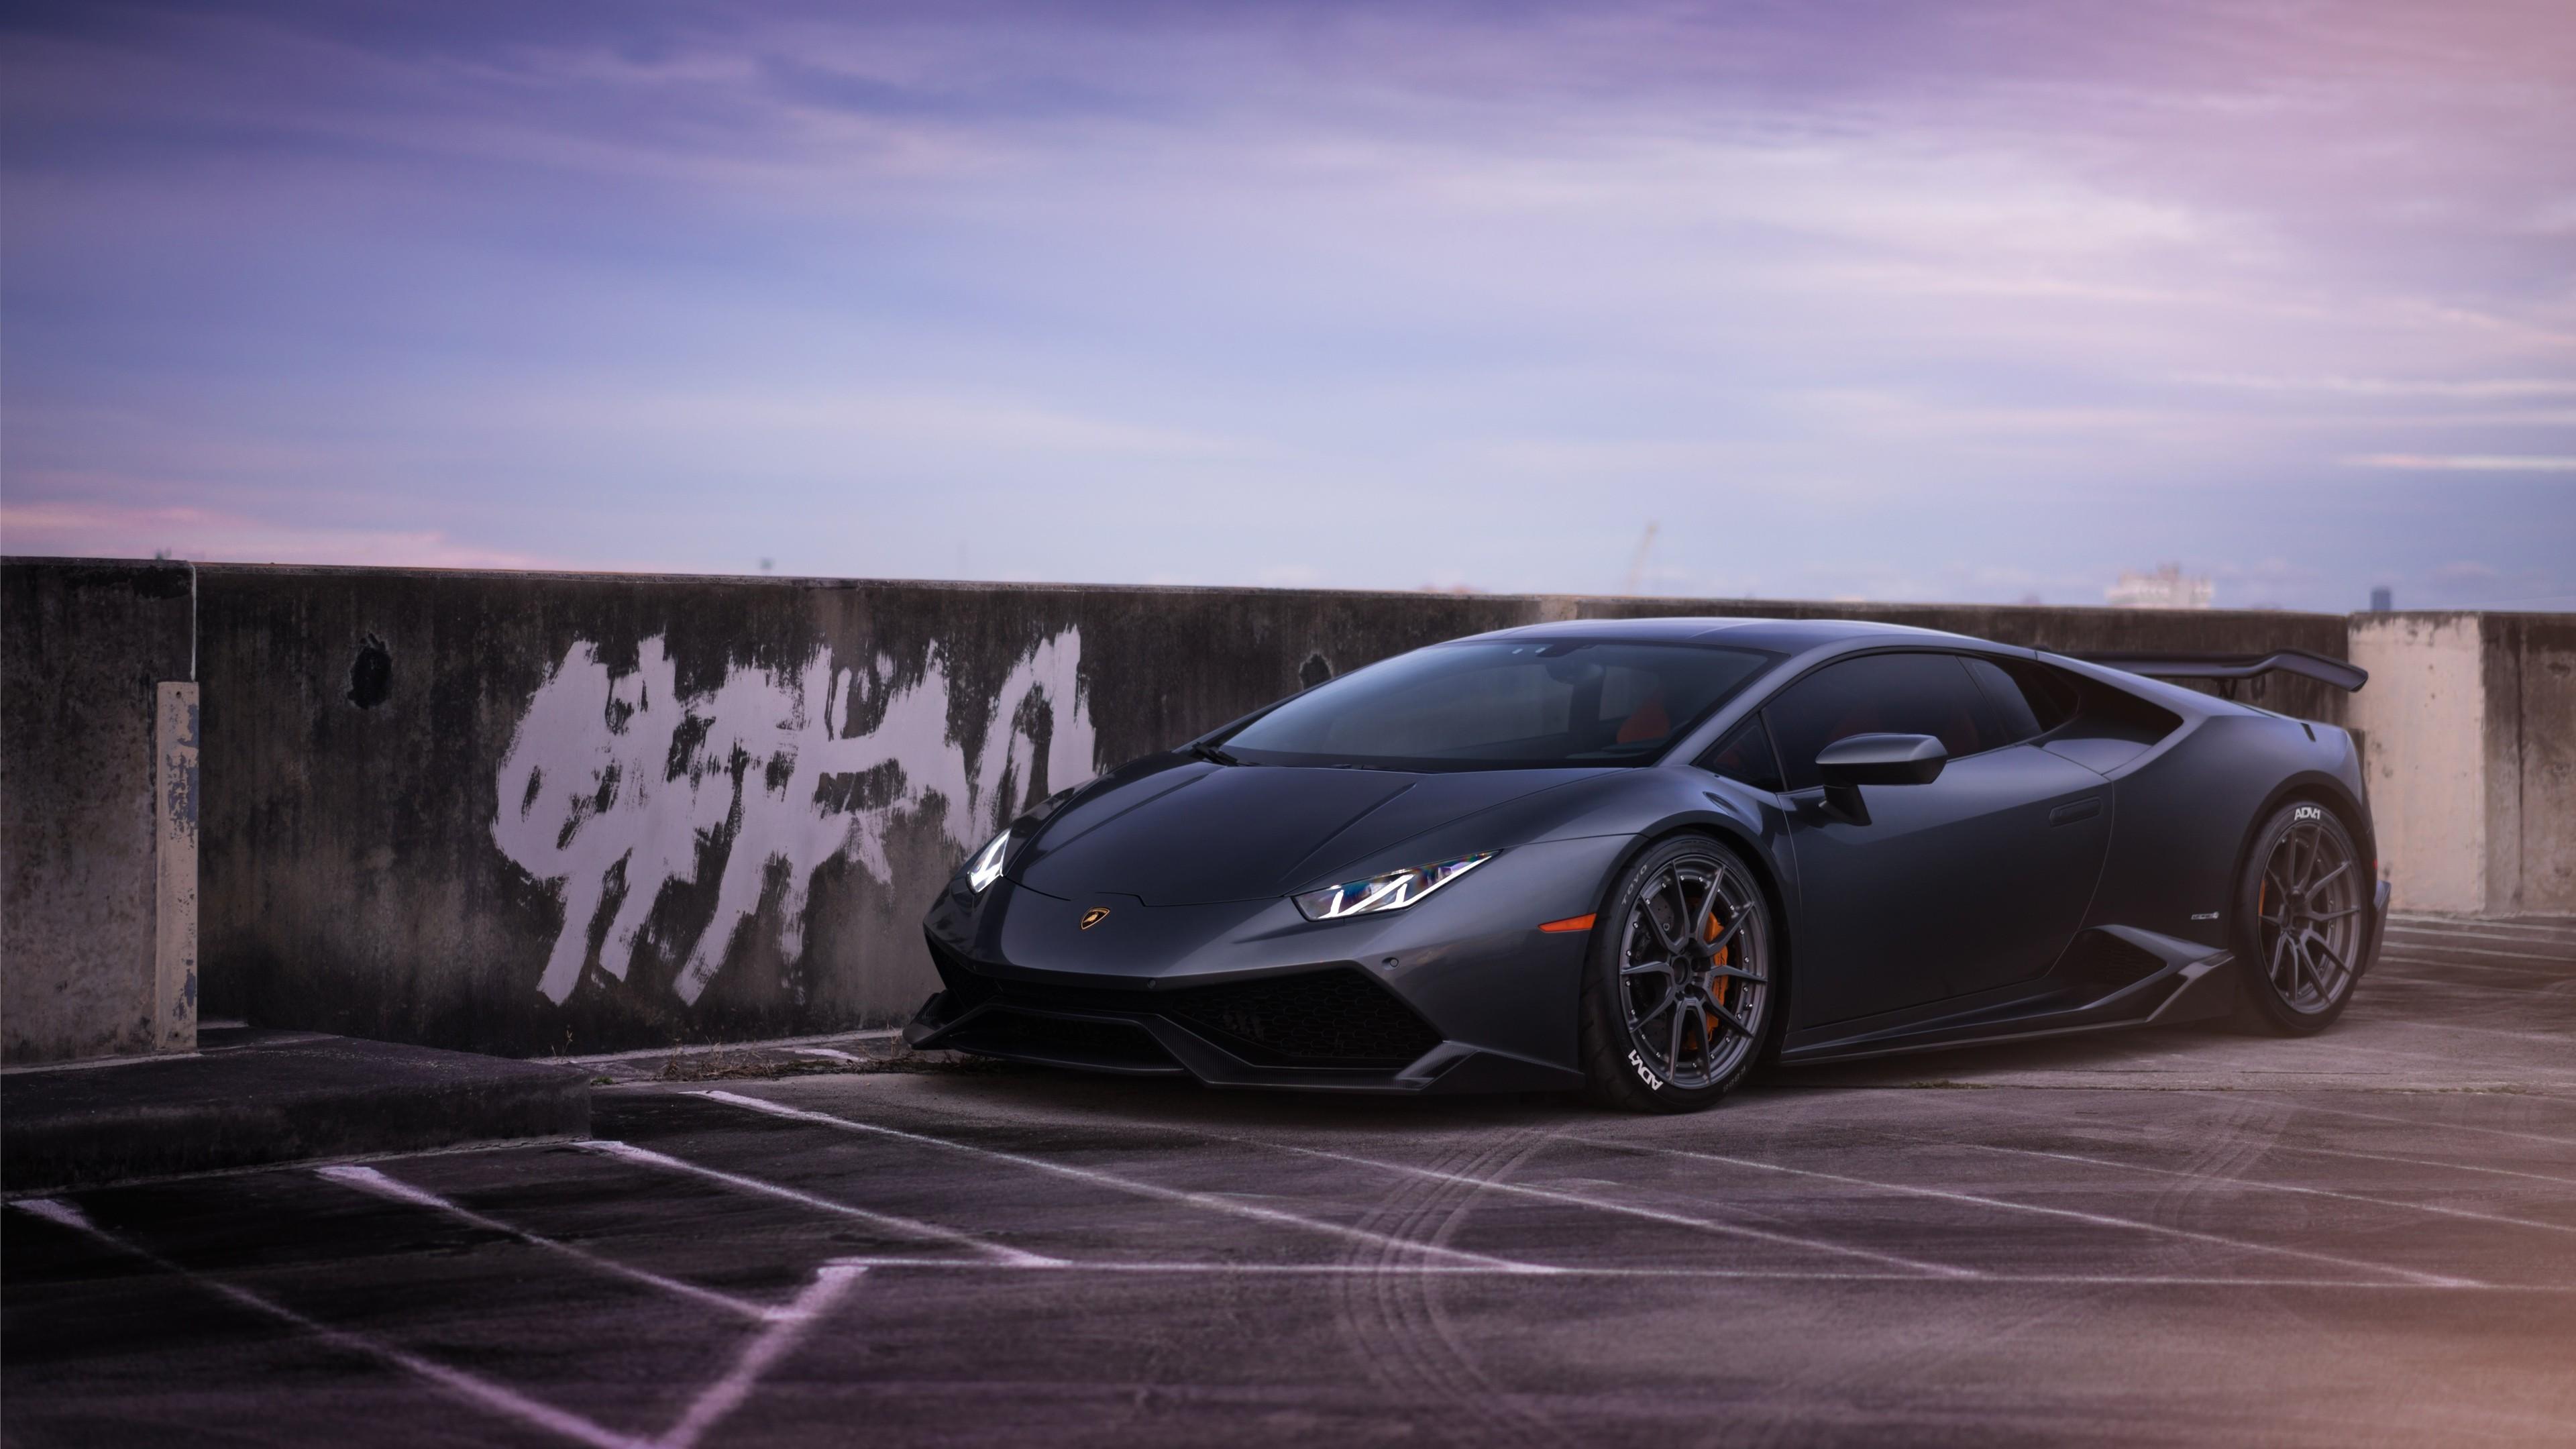 Lamborghini Huracan On Adv1 Wheels 2 Wallpaper  Hd Car